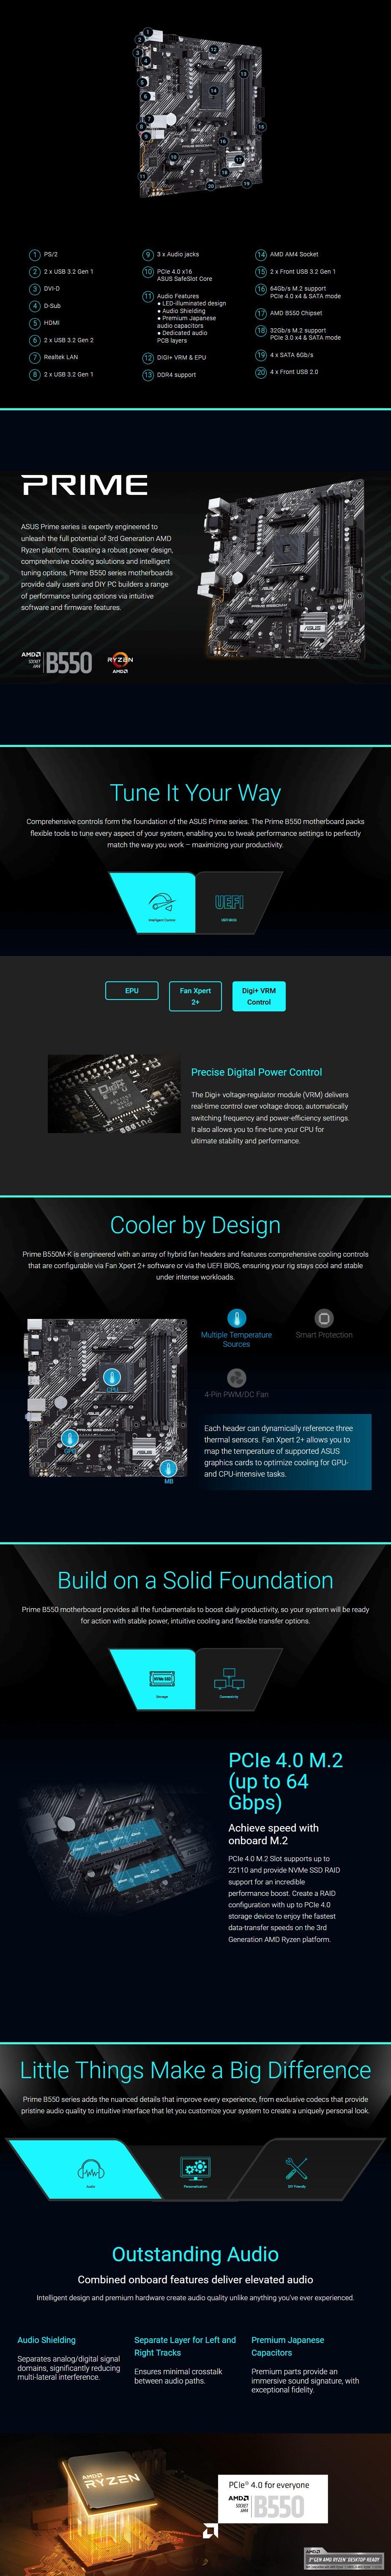 asus-prime-b550mk-am4-microatx-motherboard-ac35553-4.jpg